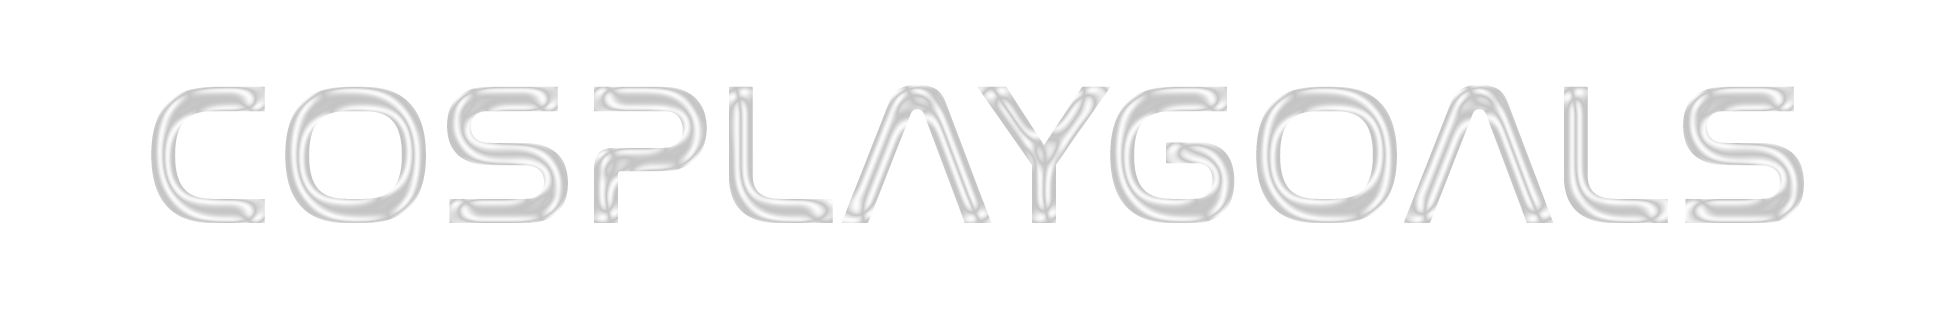 Cosplay Goals Logo